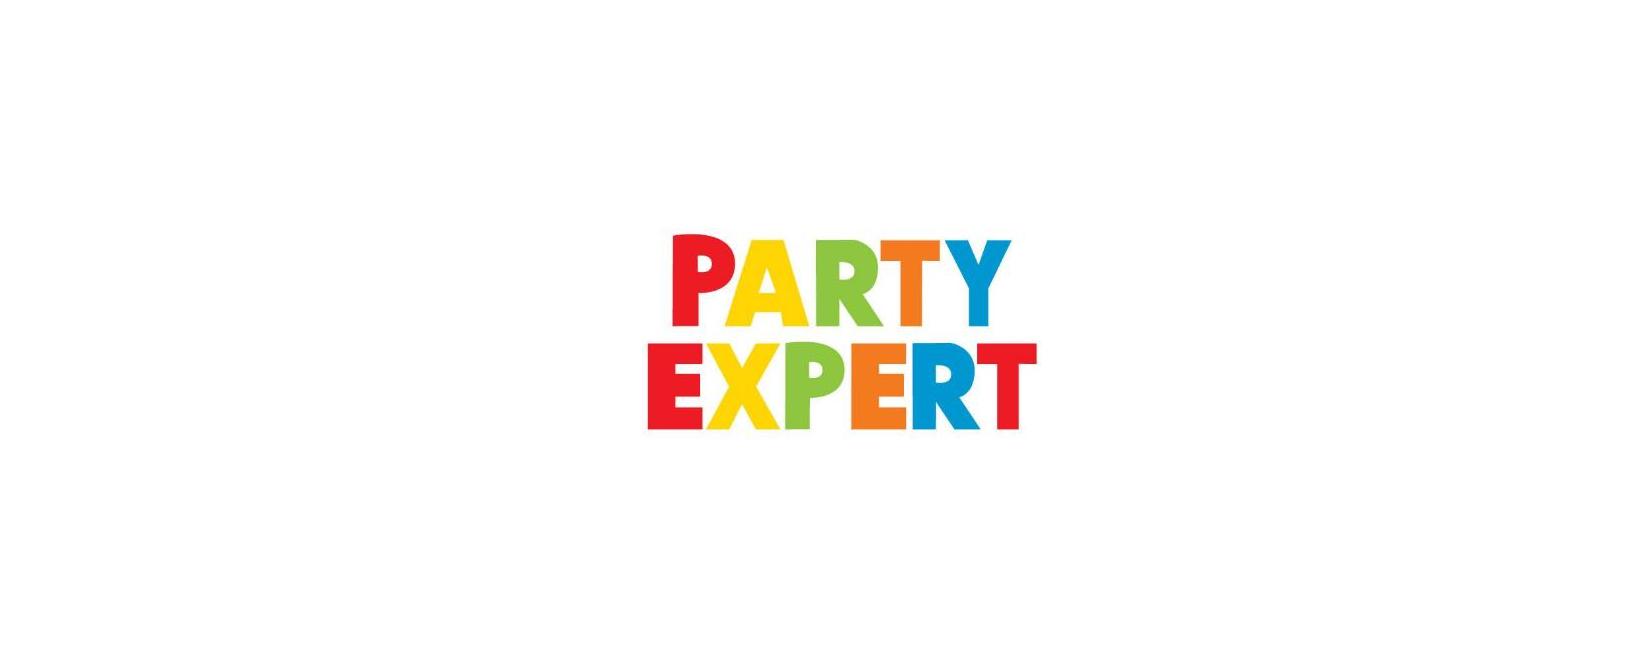 Party Expert Discount Code 2021